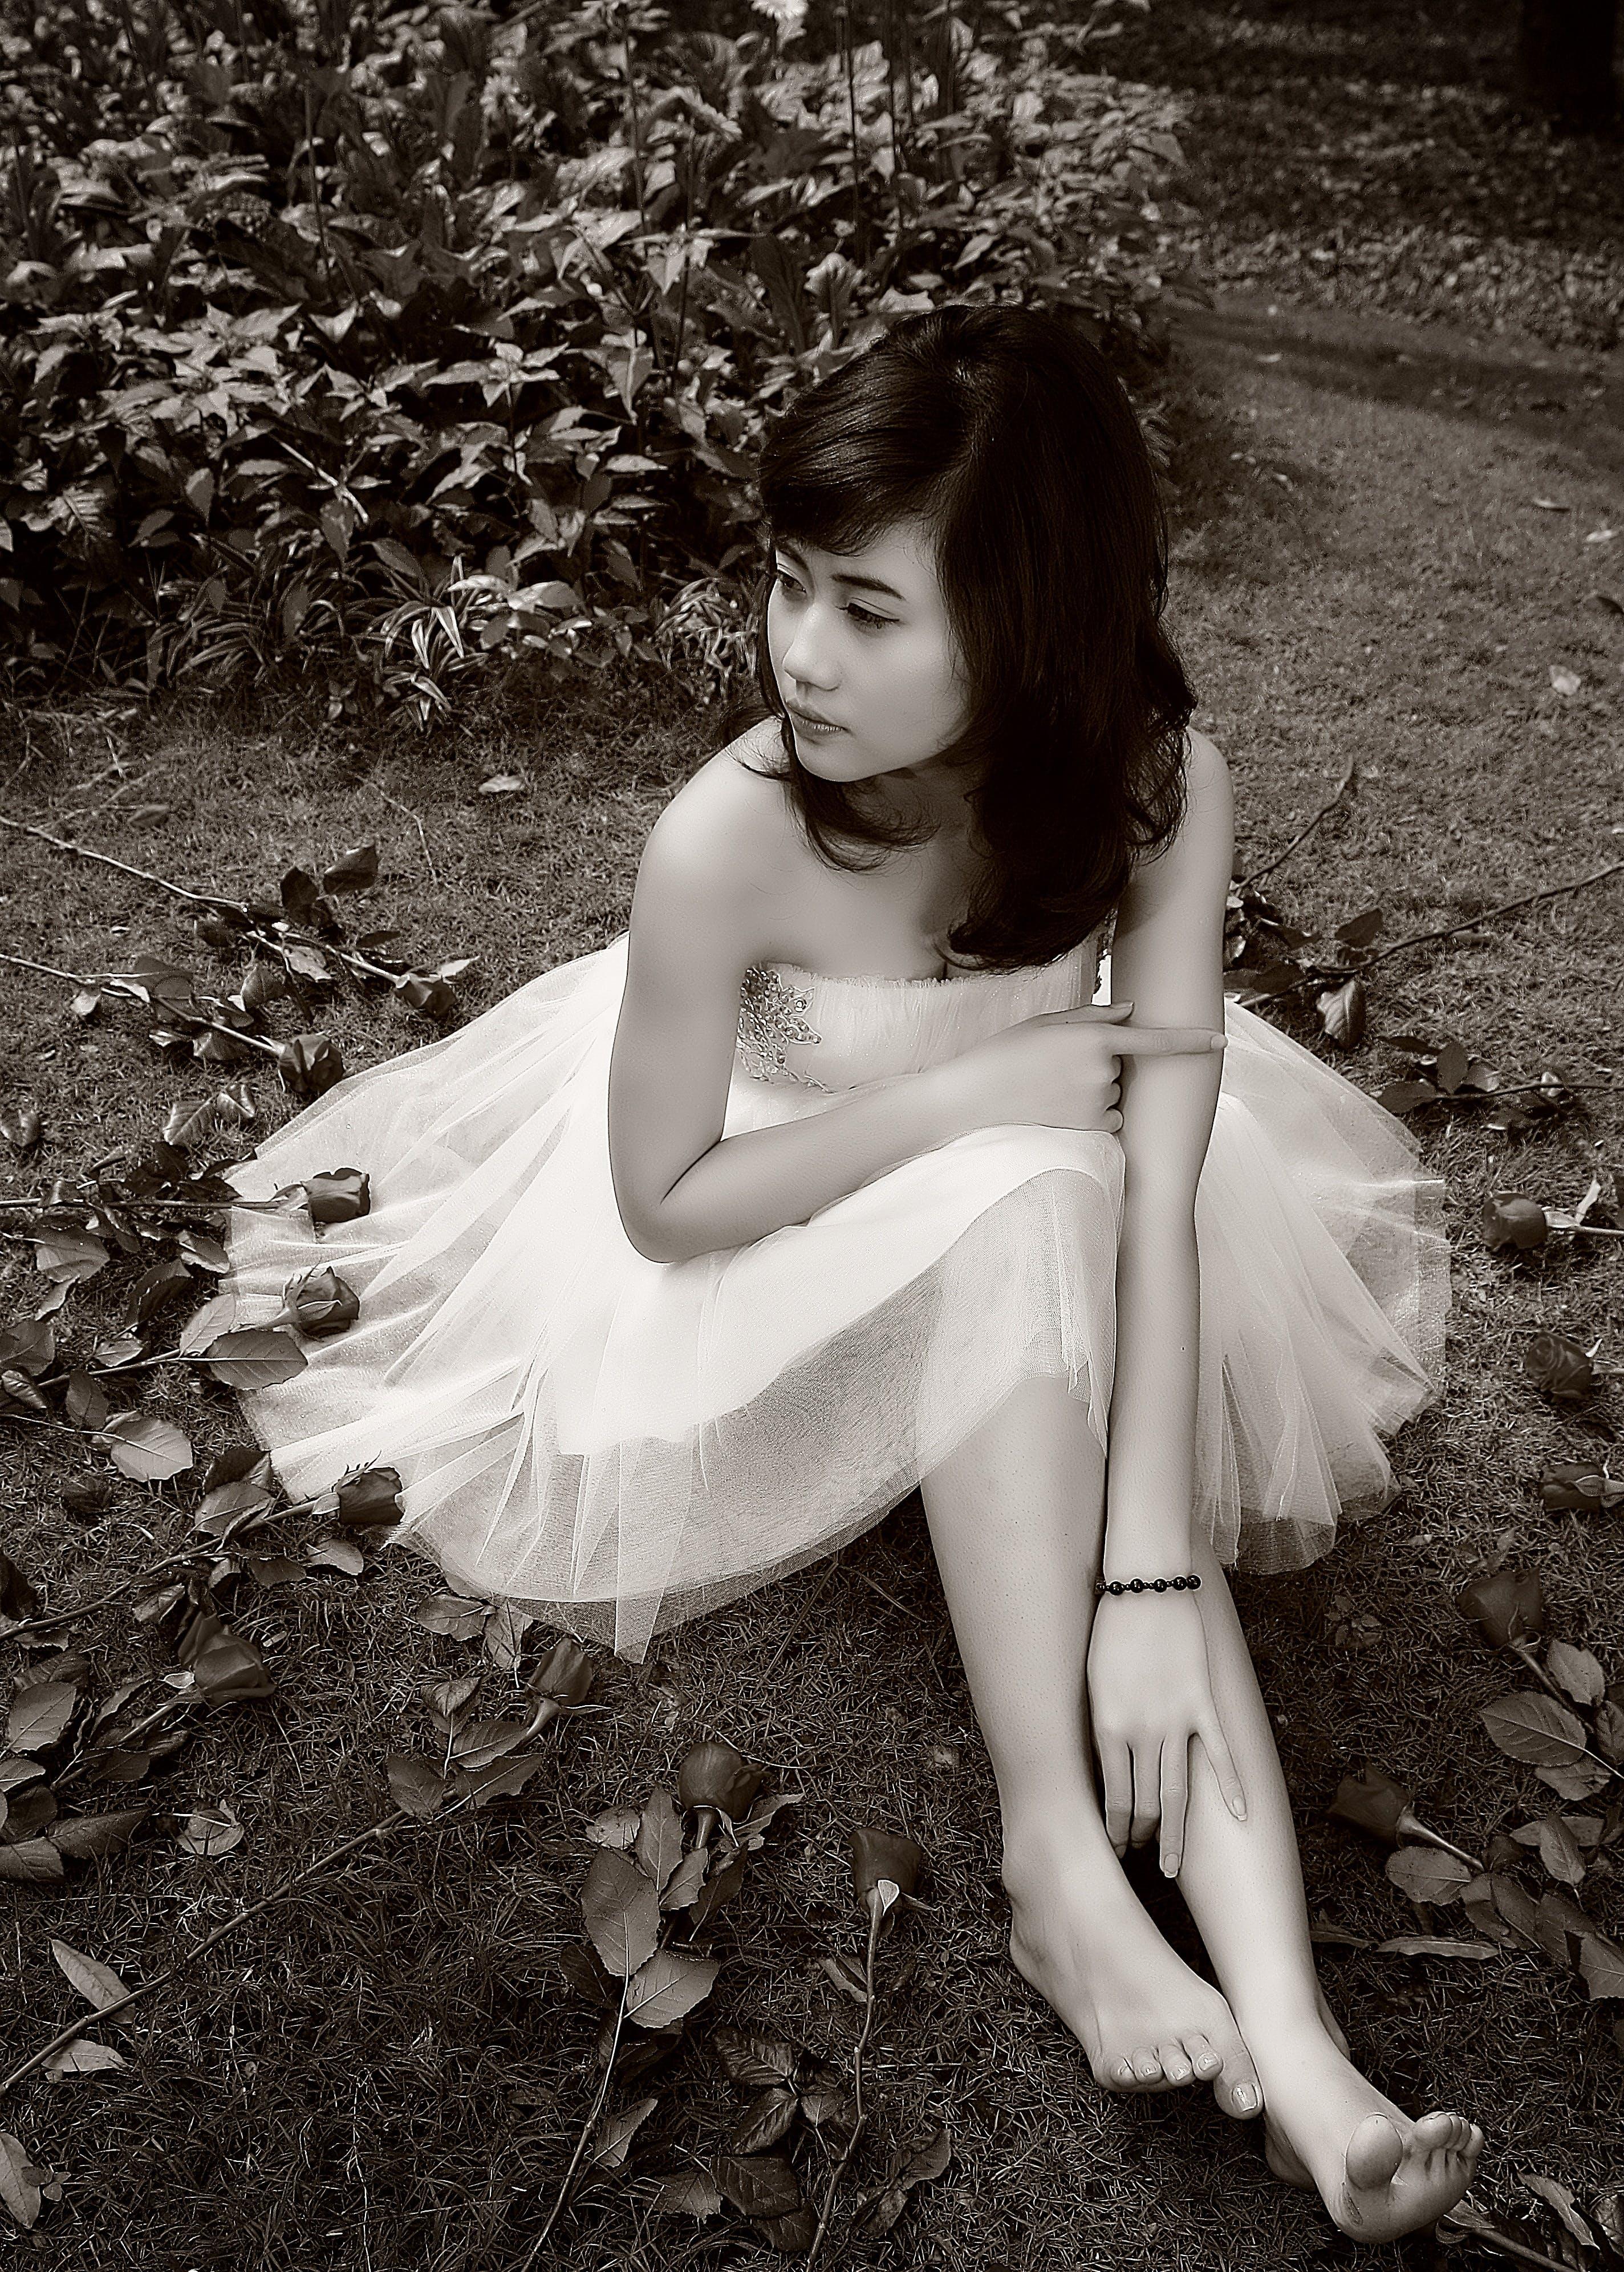 Woman Sitting on Ground Near Plants